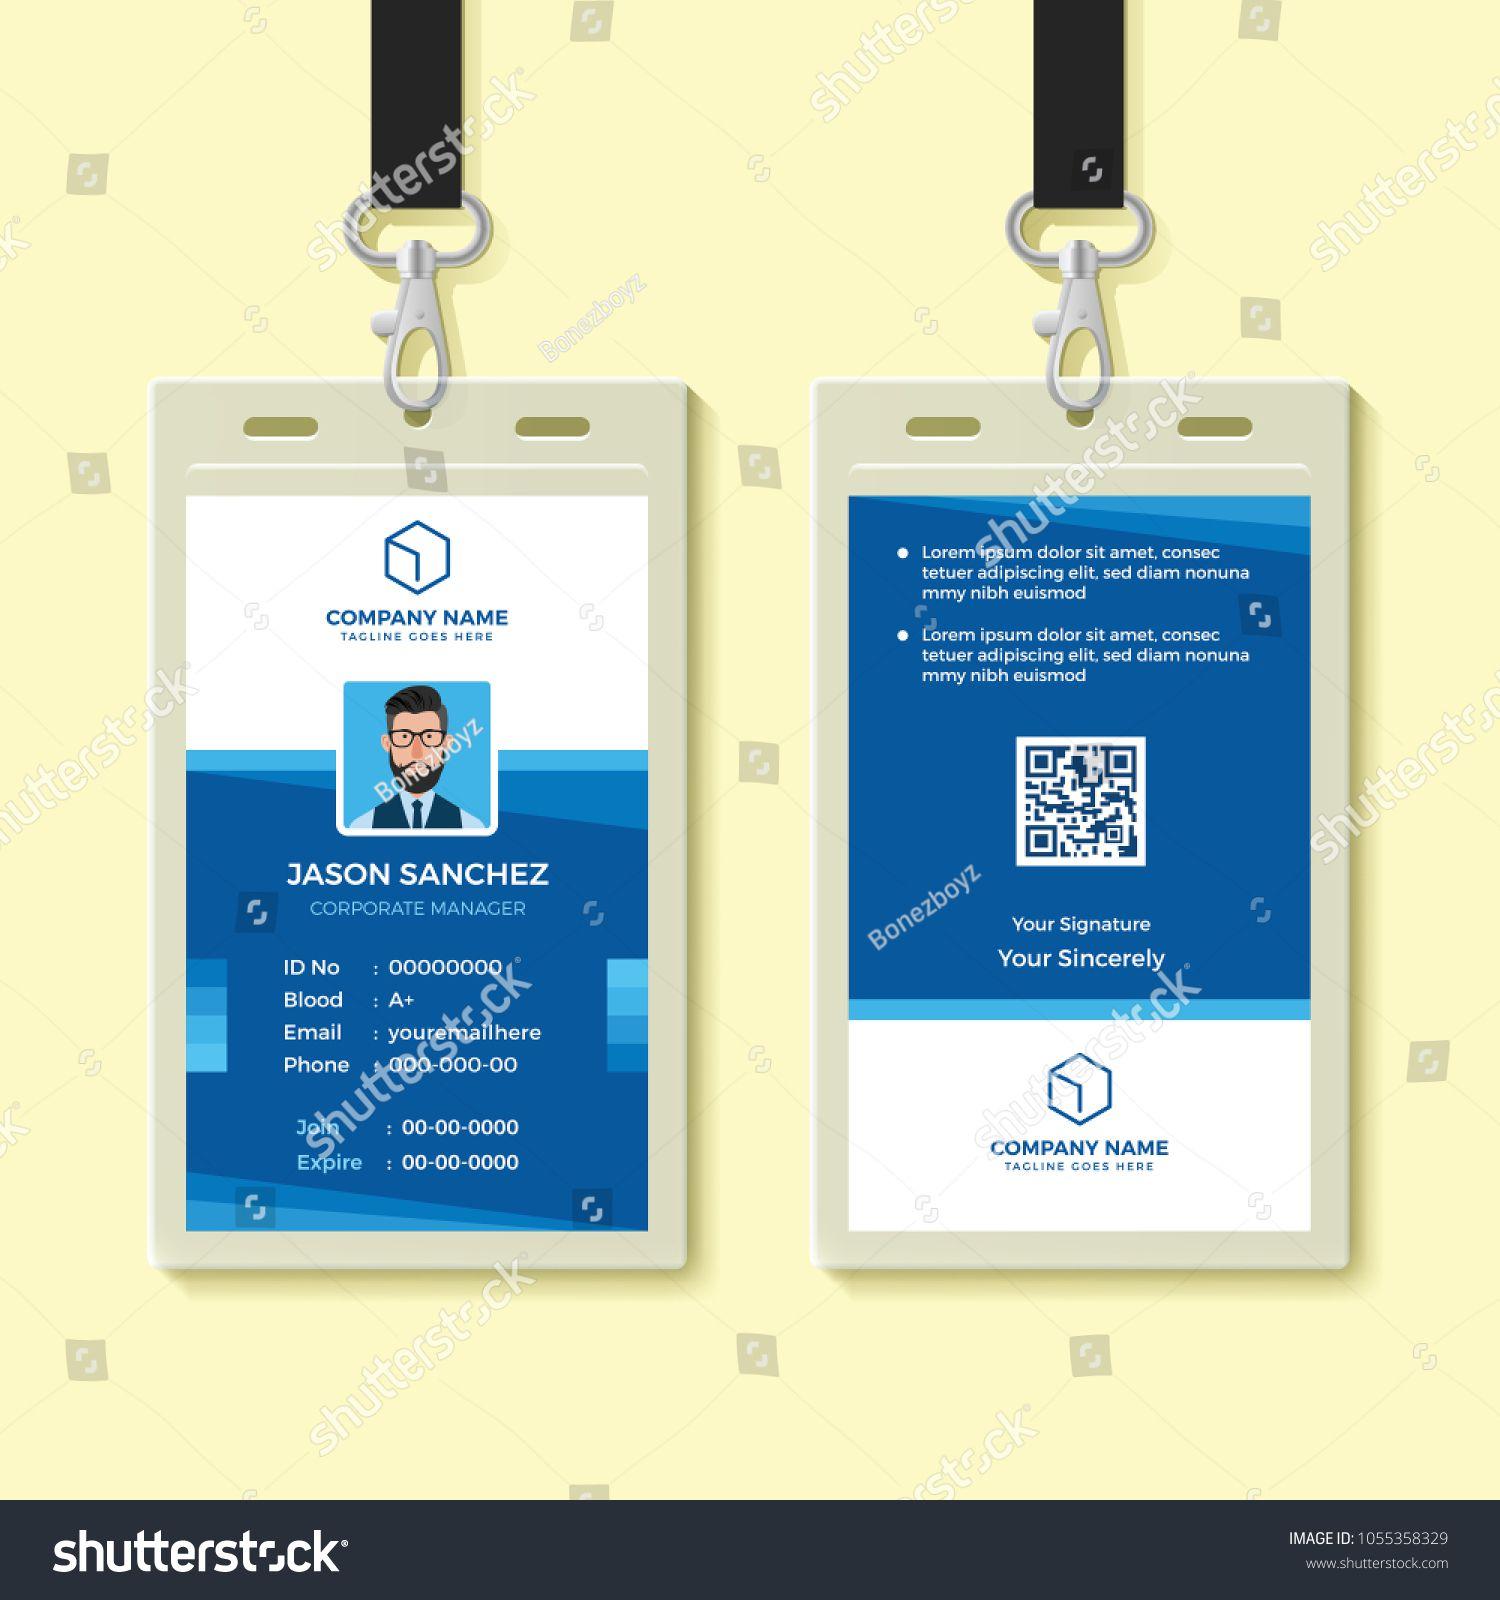 009 Shocking Employee Id Badge Template Idea  Avery Card Free Download WordFull